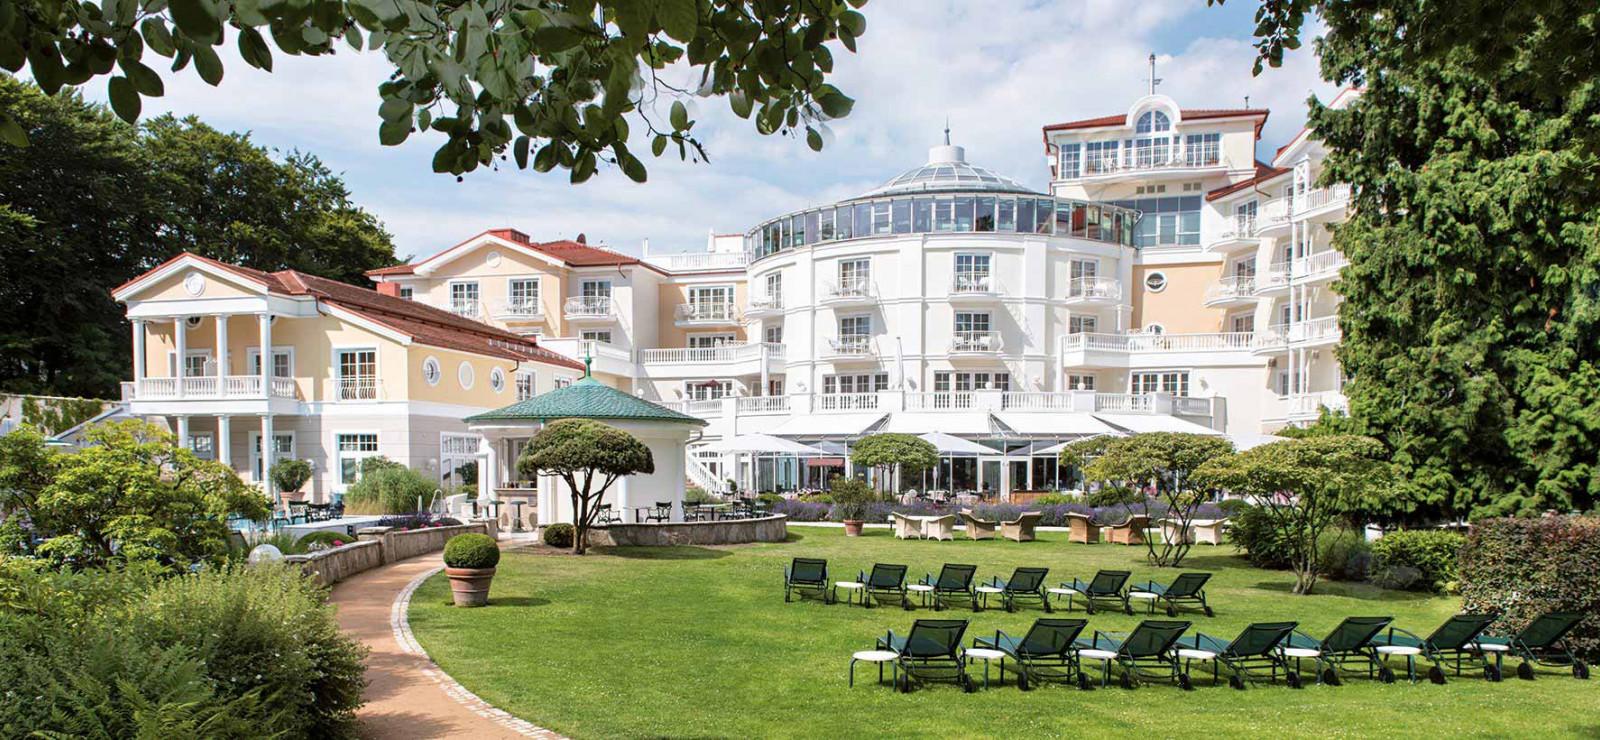 Hotel Travel Charme Strandidyll Heringsdorf Bilder | Bild 1